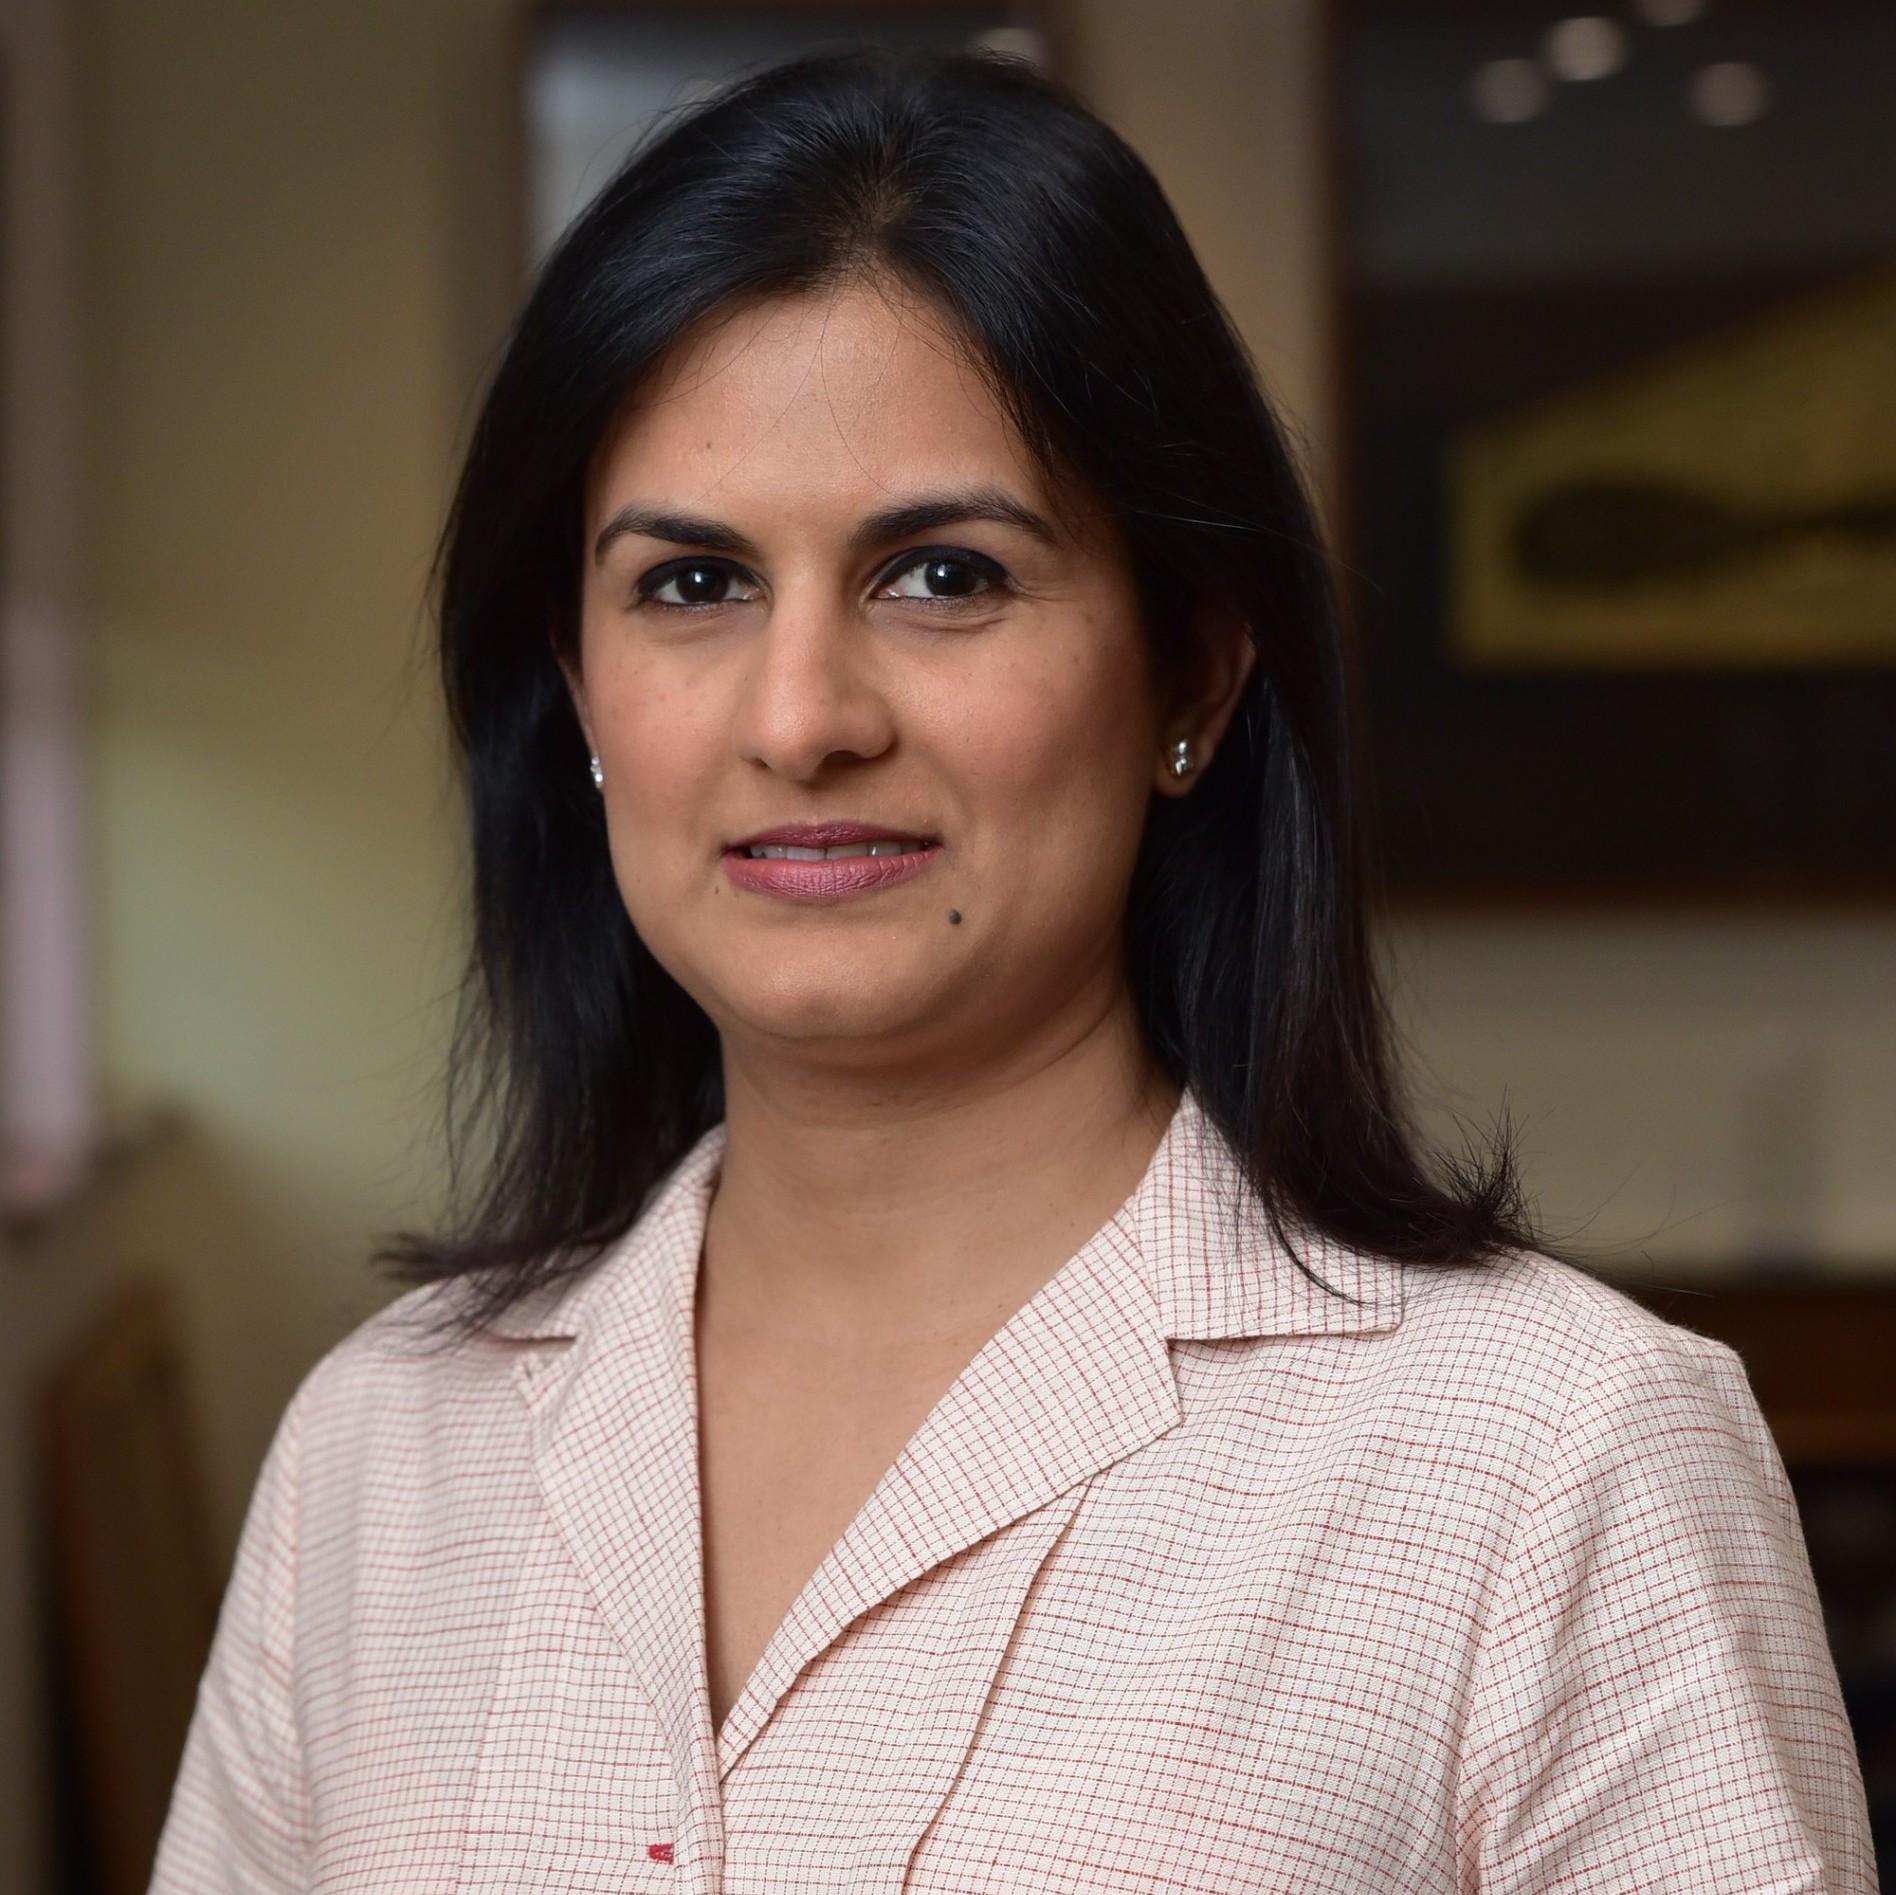 photo of Swati Salgaocar